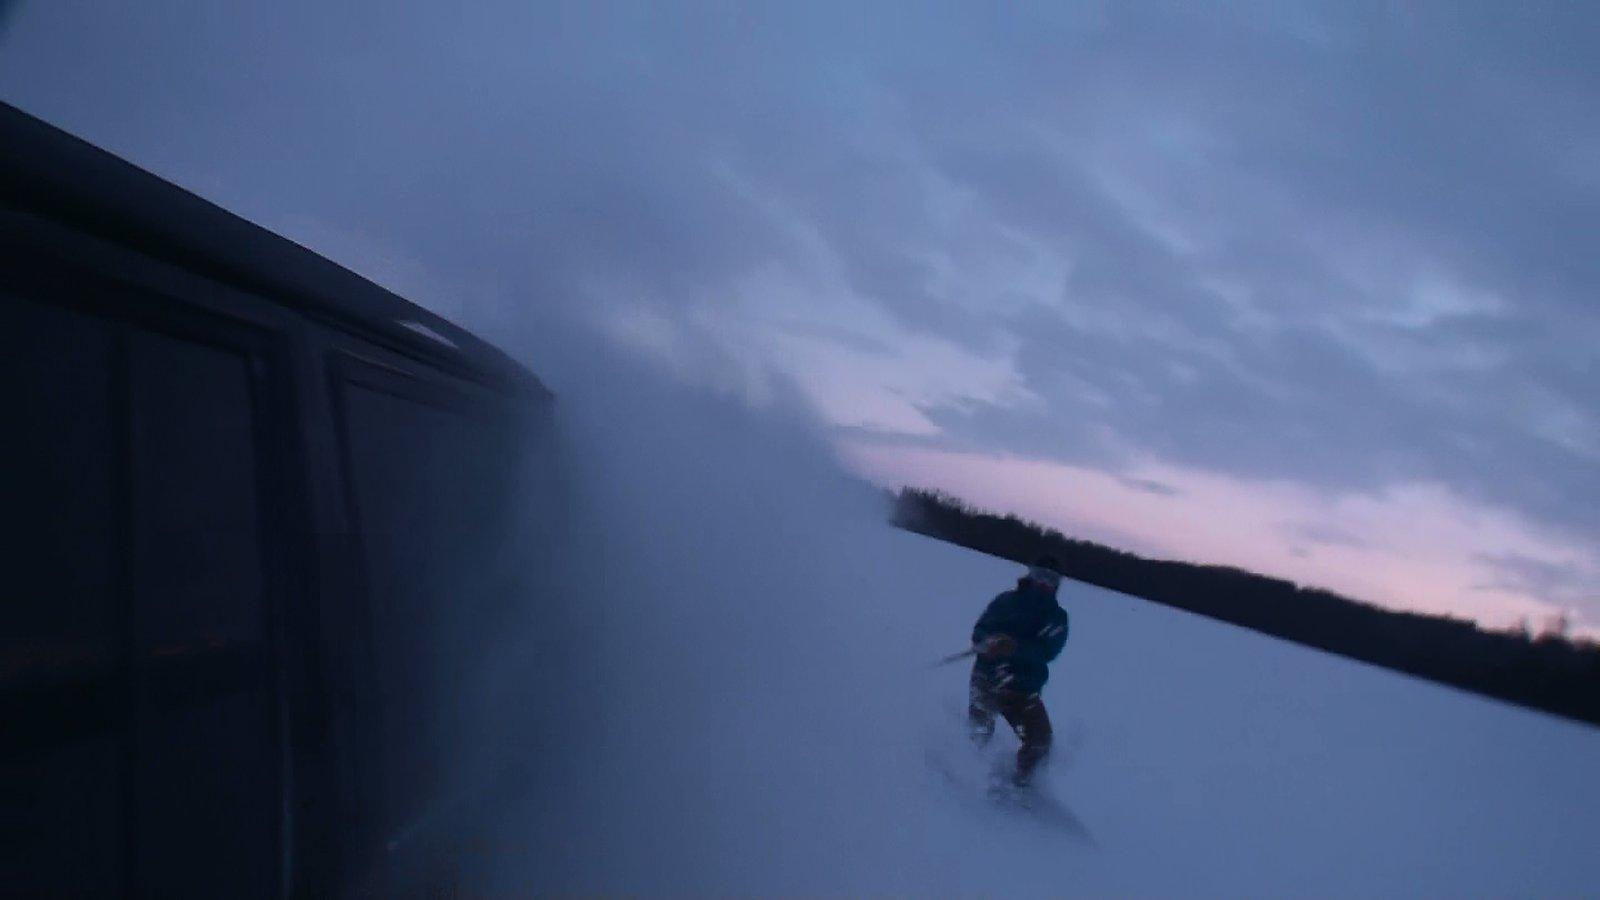 Farmer's skiing